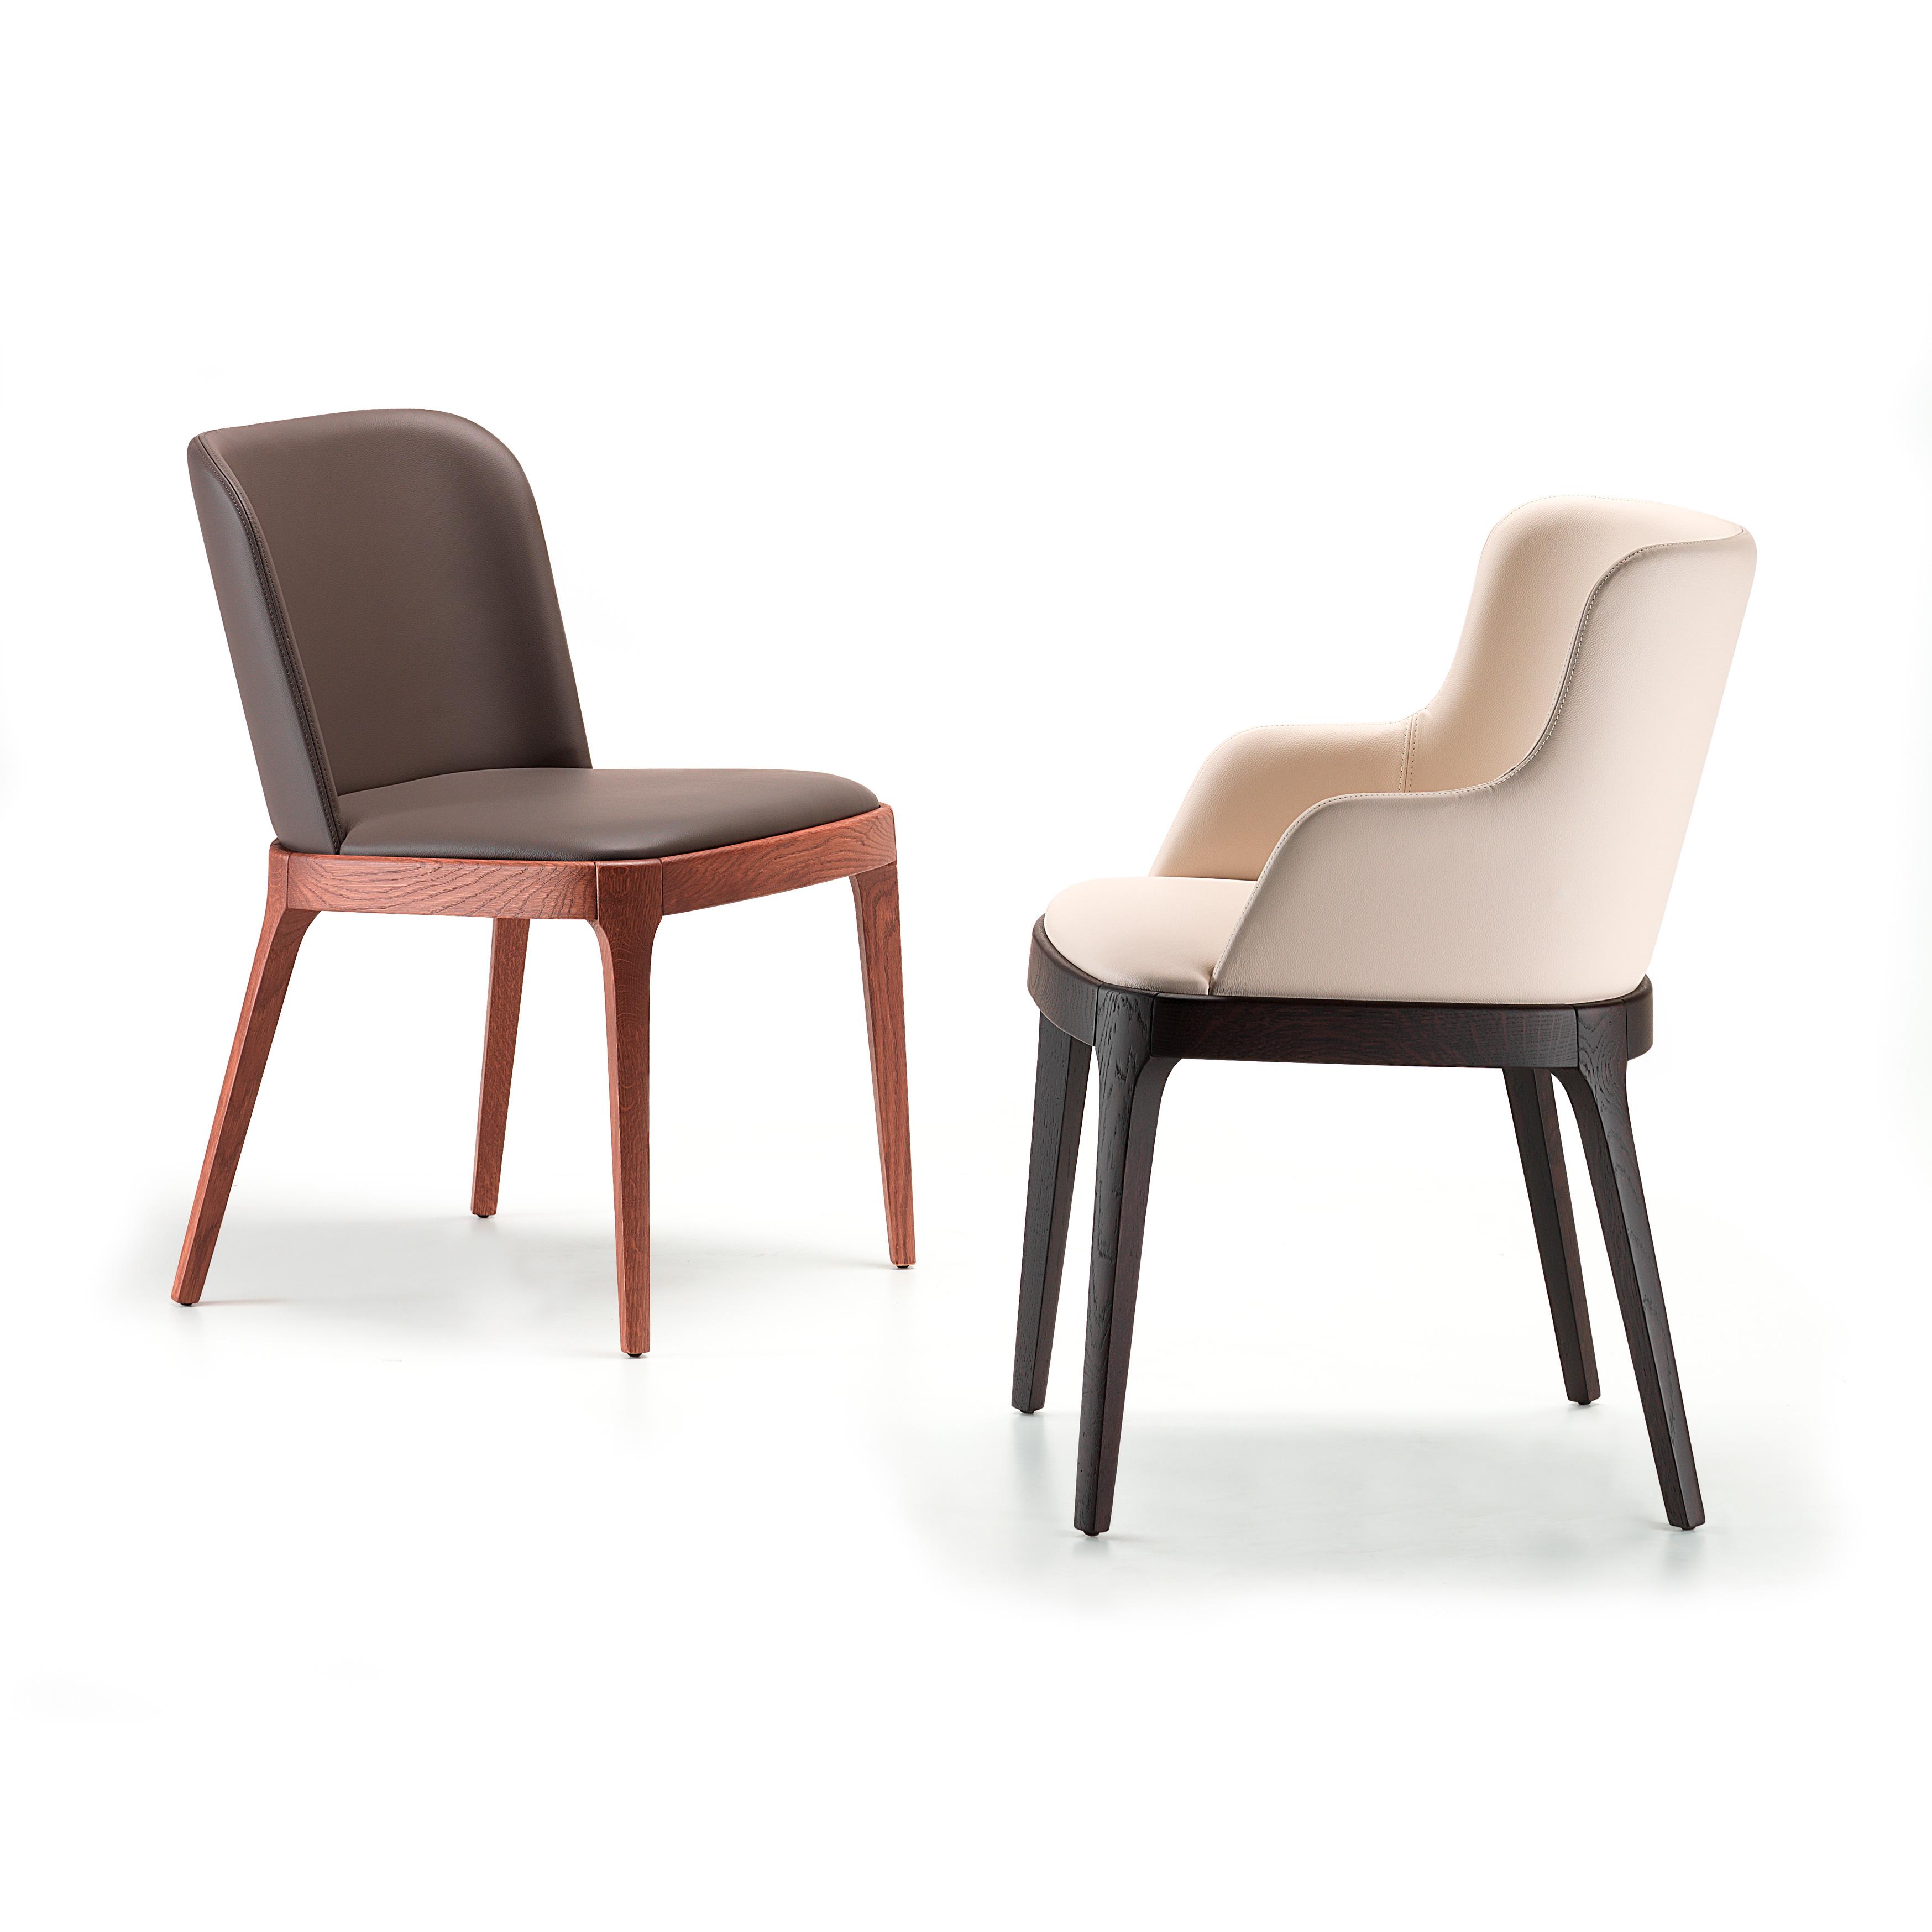 Modern Chairs Top 5 Luxury Fabric Brands Exhibiting At: Italian Designer & Luxury